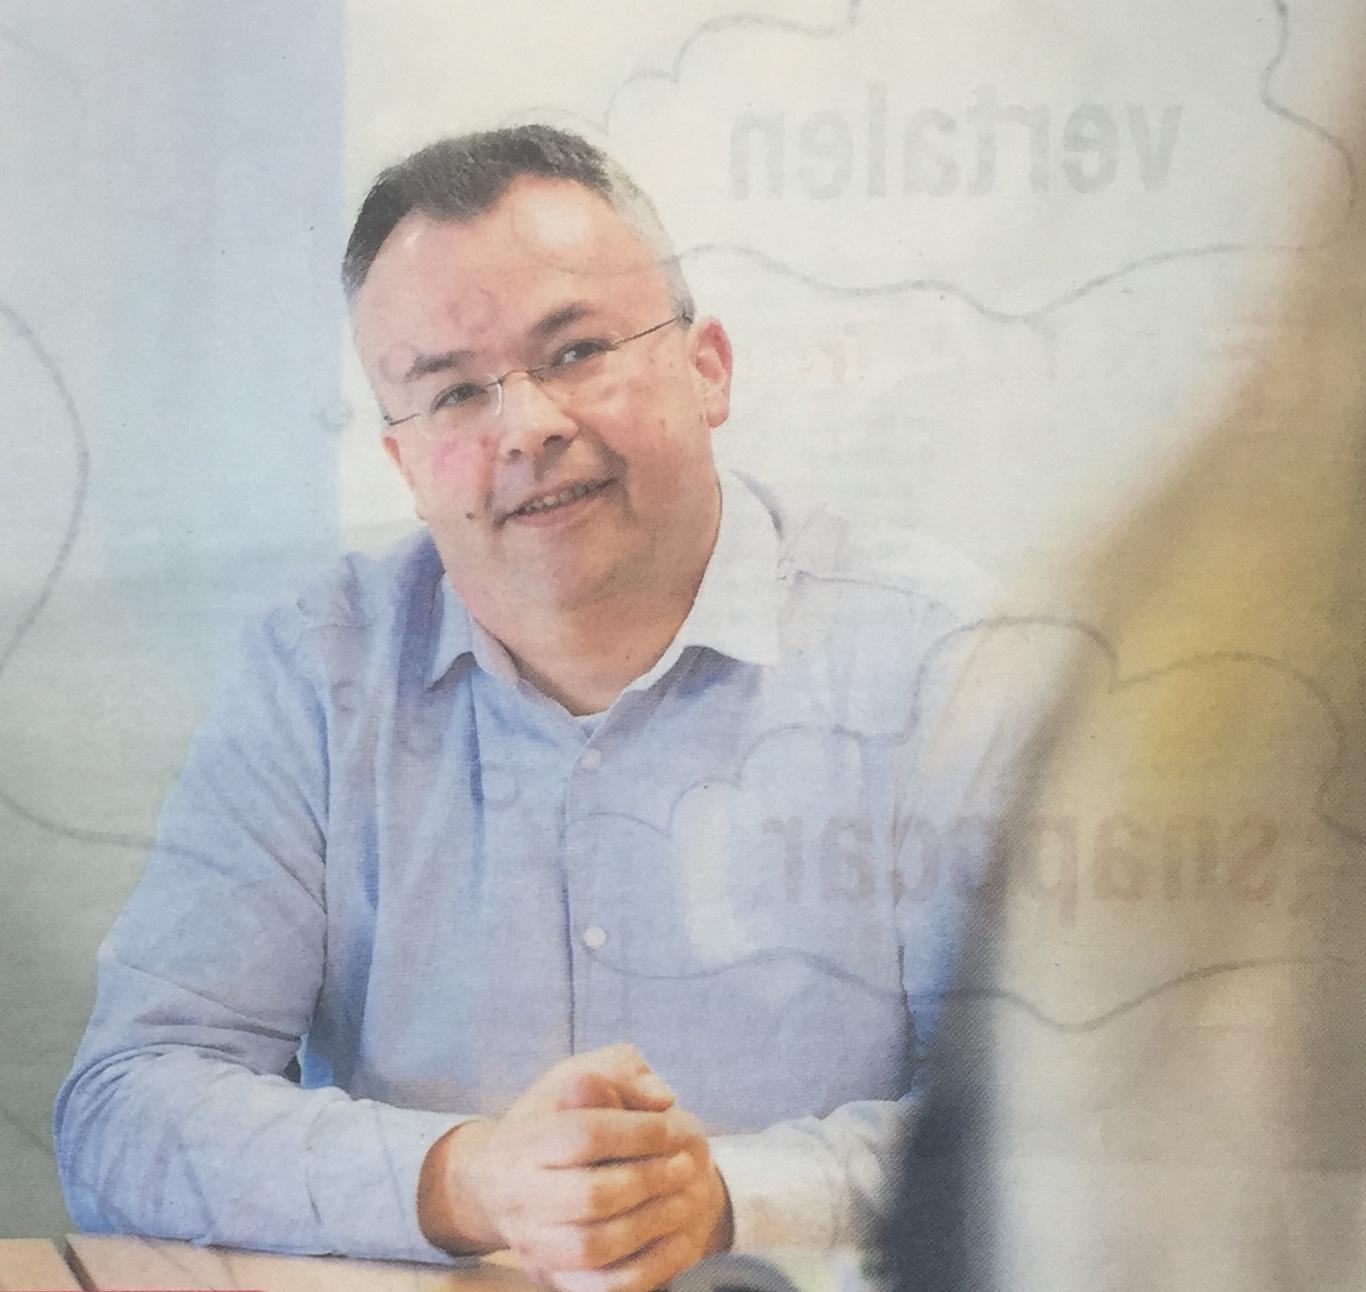 Mark Jansen Ambitie JobCafé